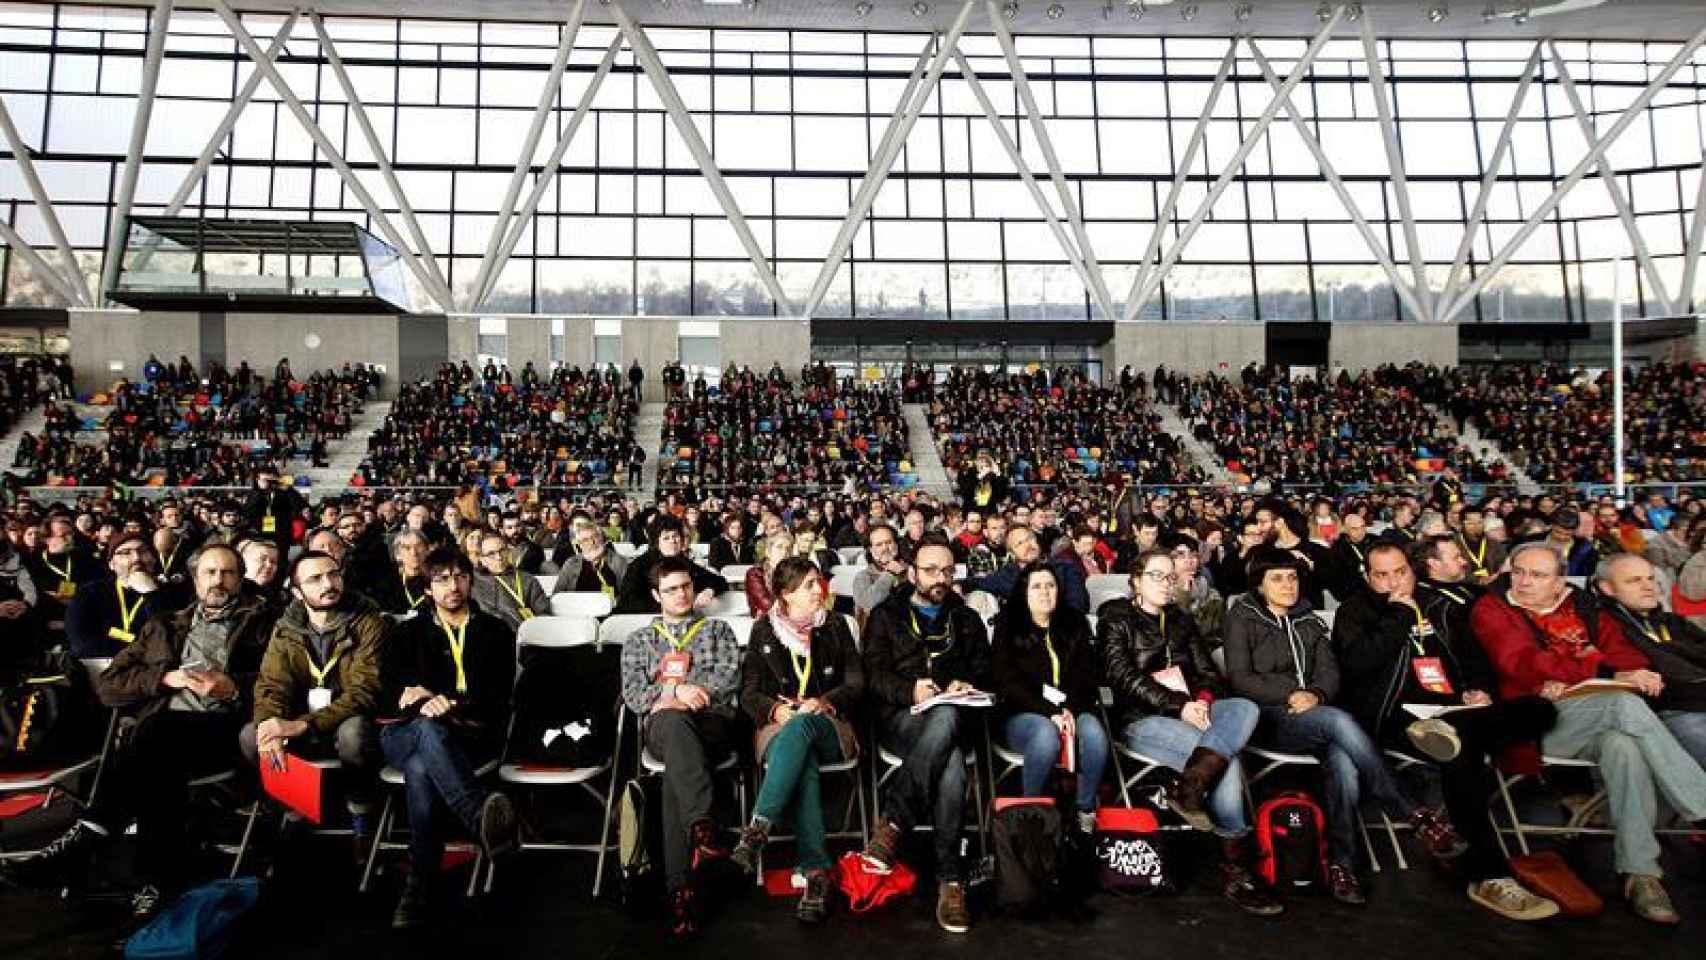 Vista general de los asistentes a la asamblea de la CUP